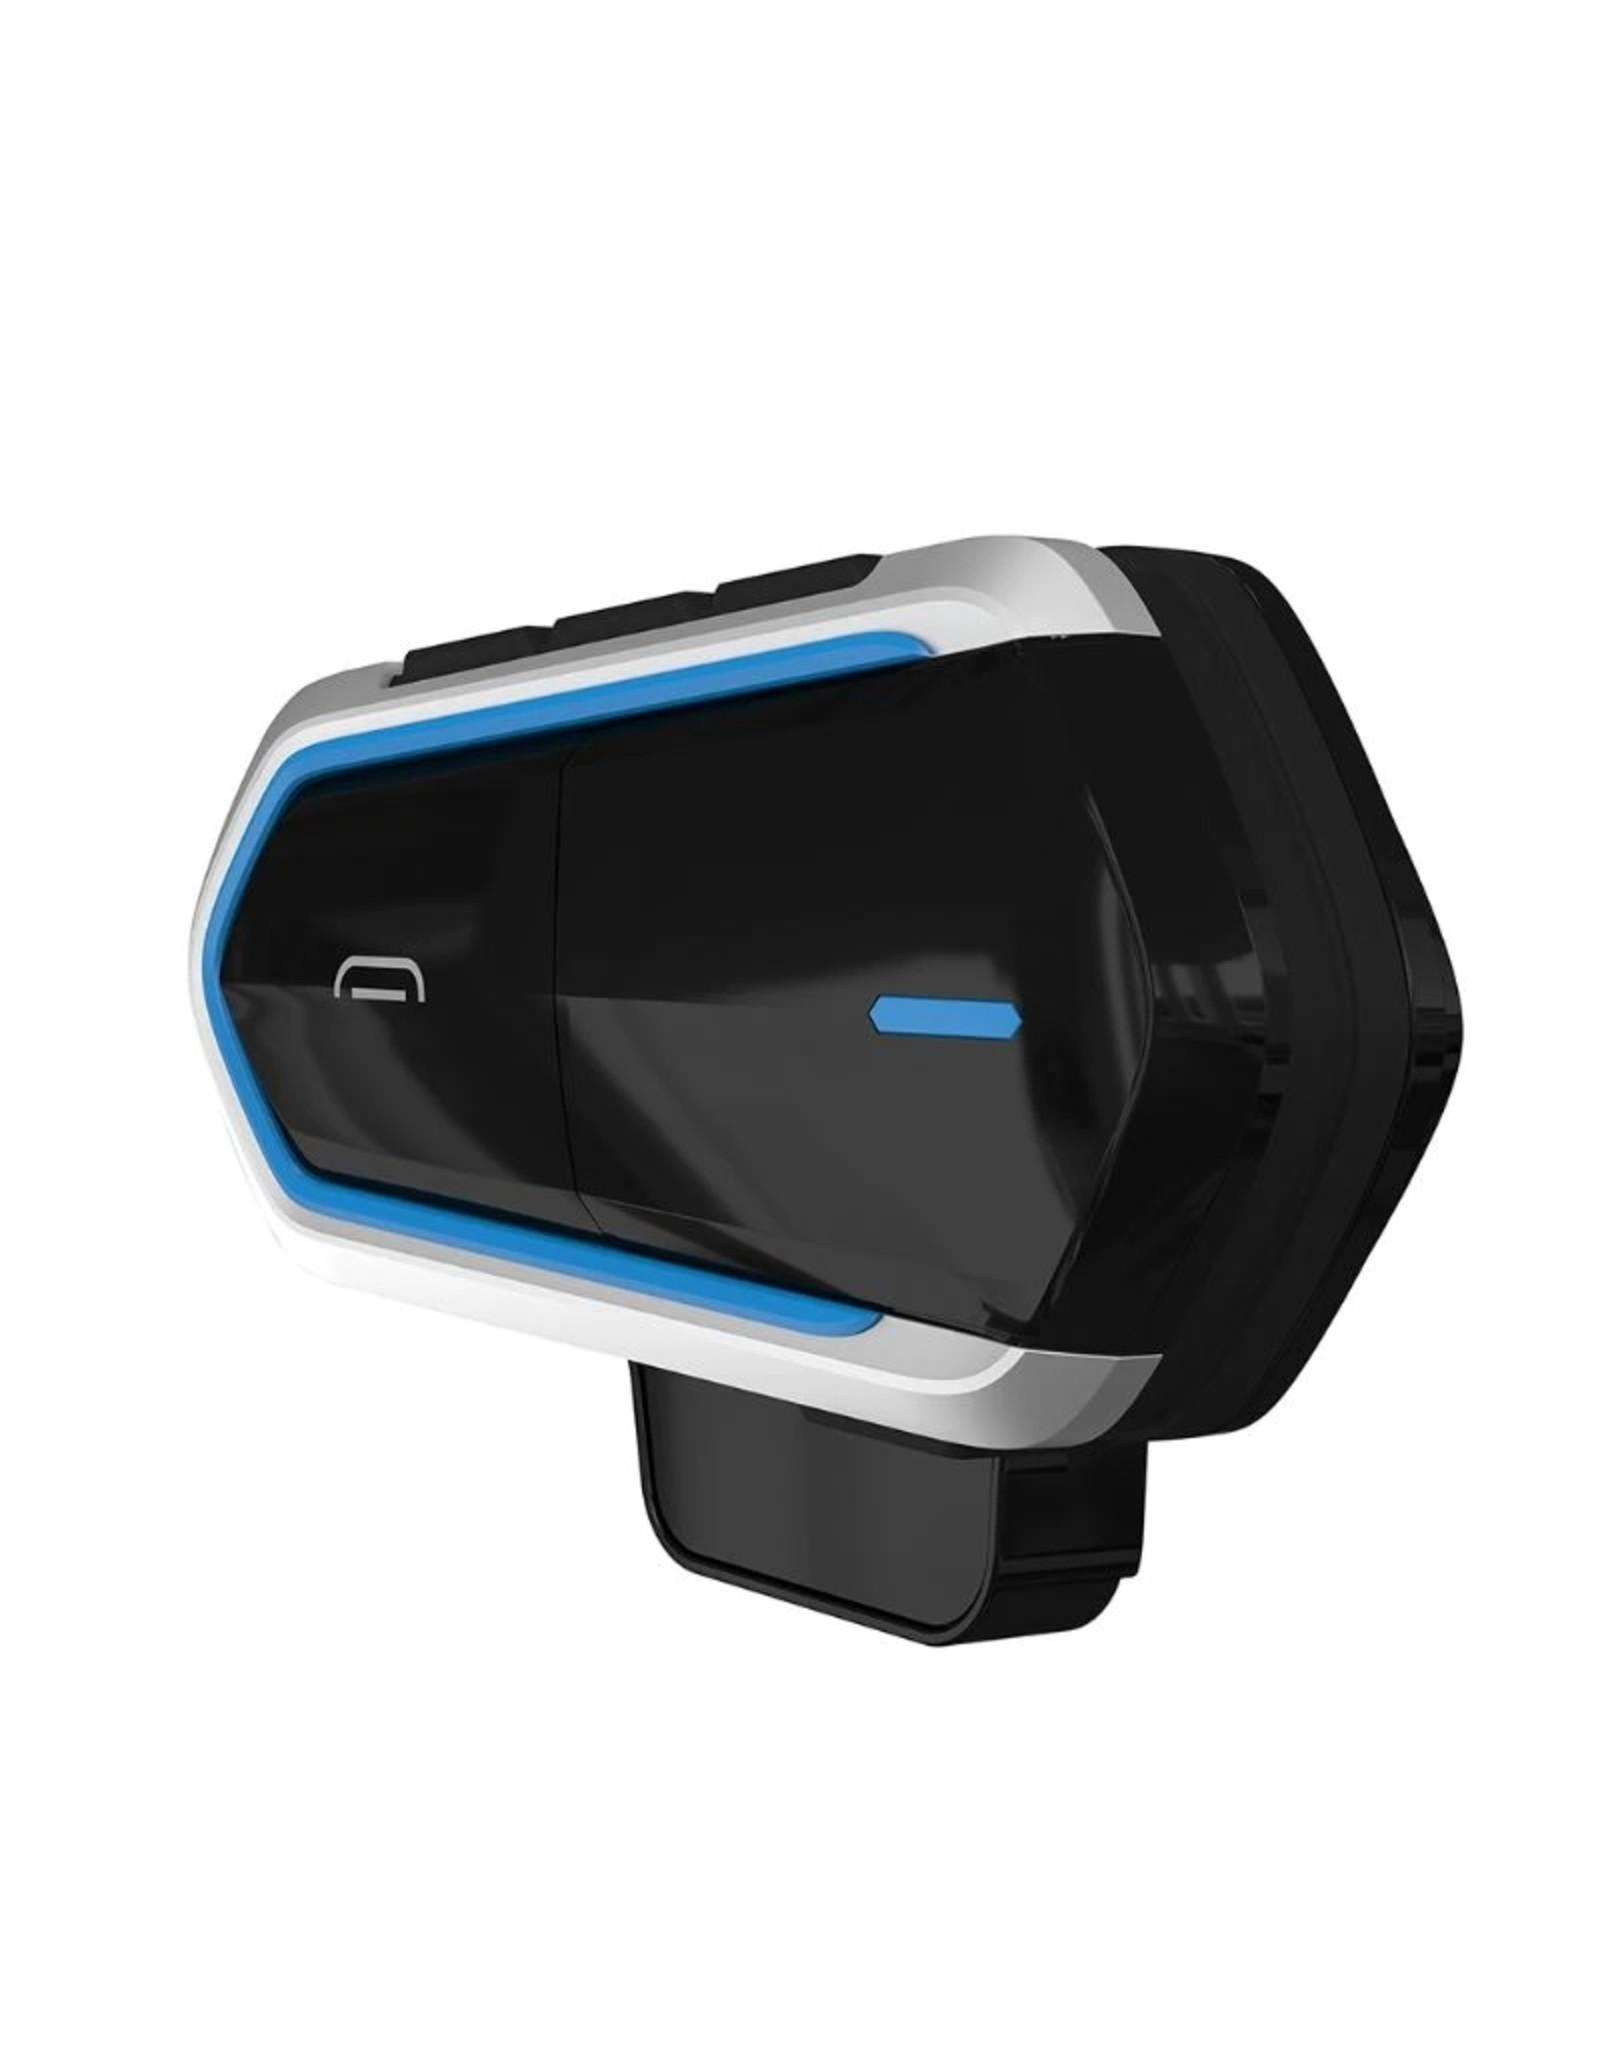 BT Motor Helm Headset - Handsfree - Intercom Communicatie - Motorfiets Bluetooth Helm Headset